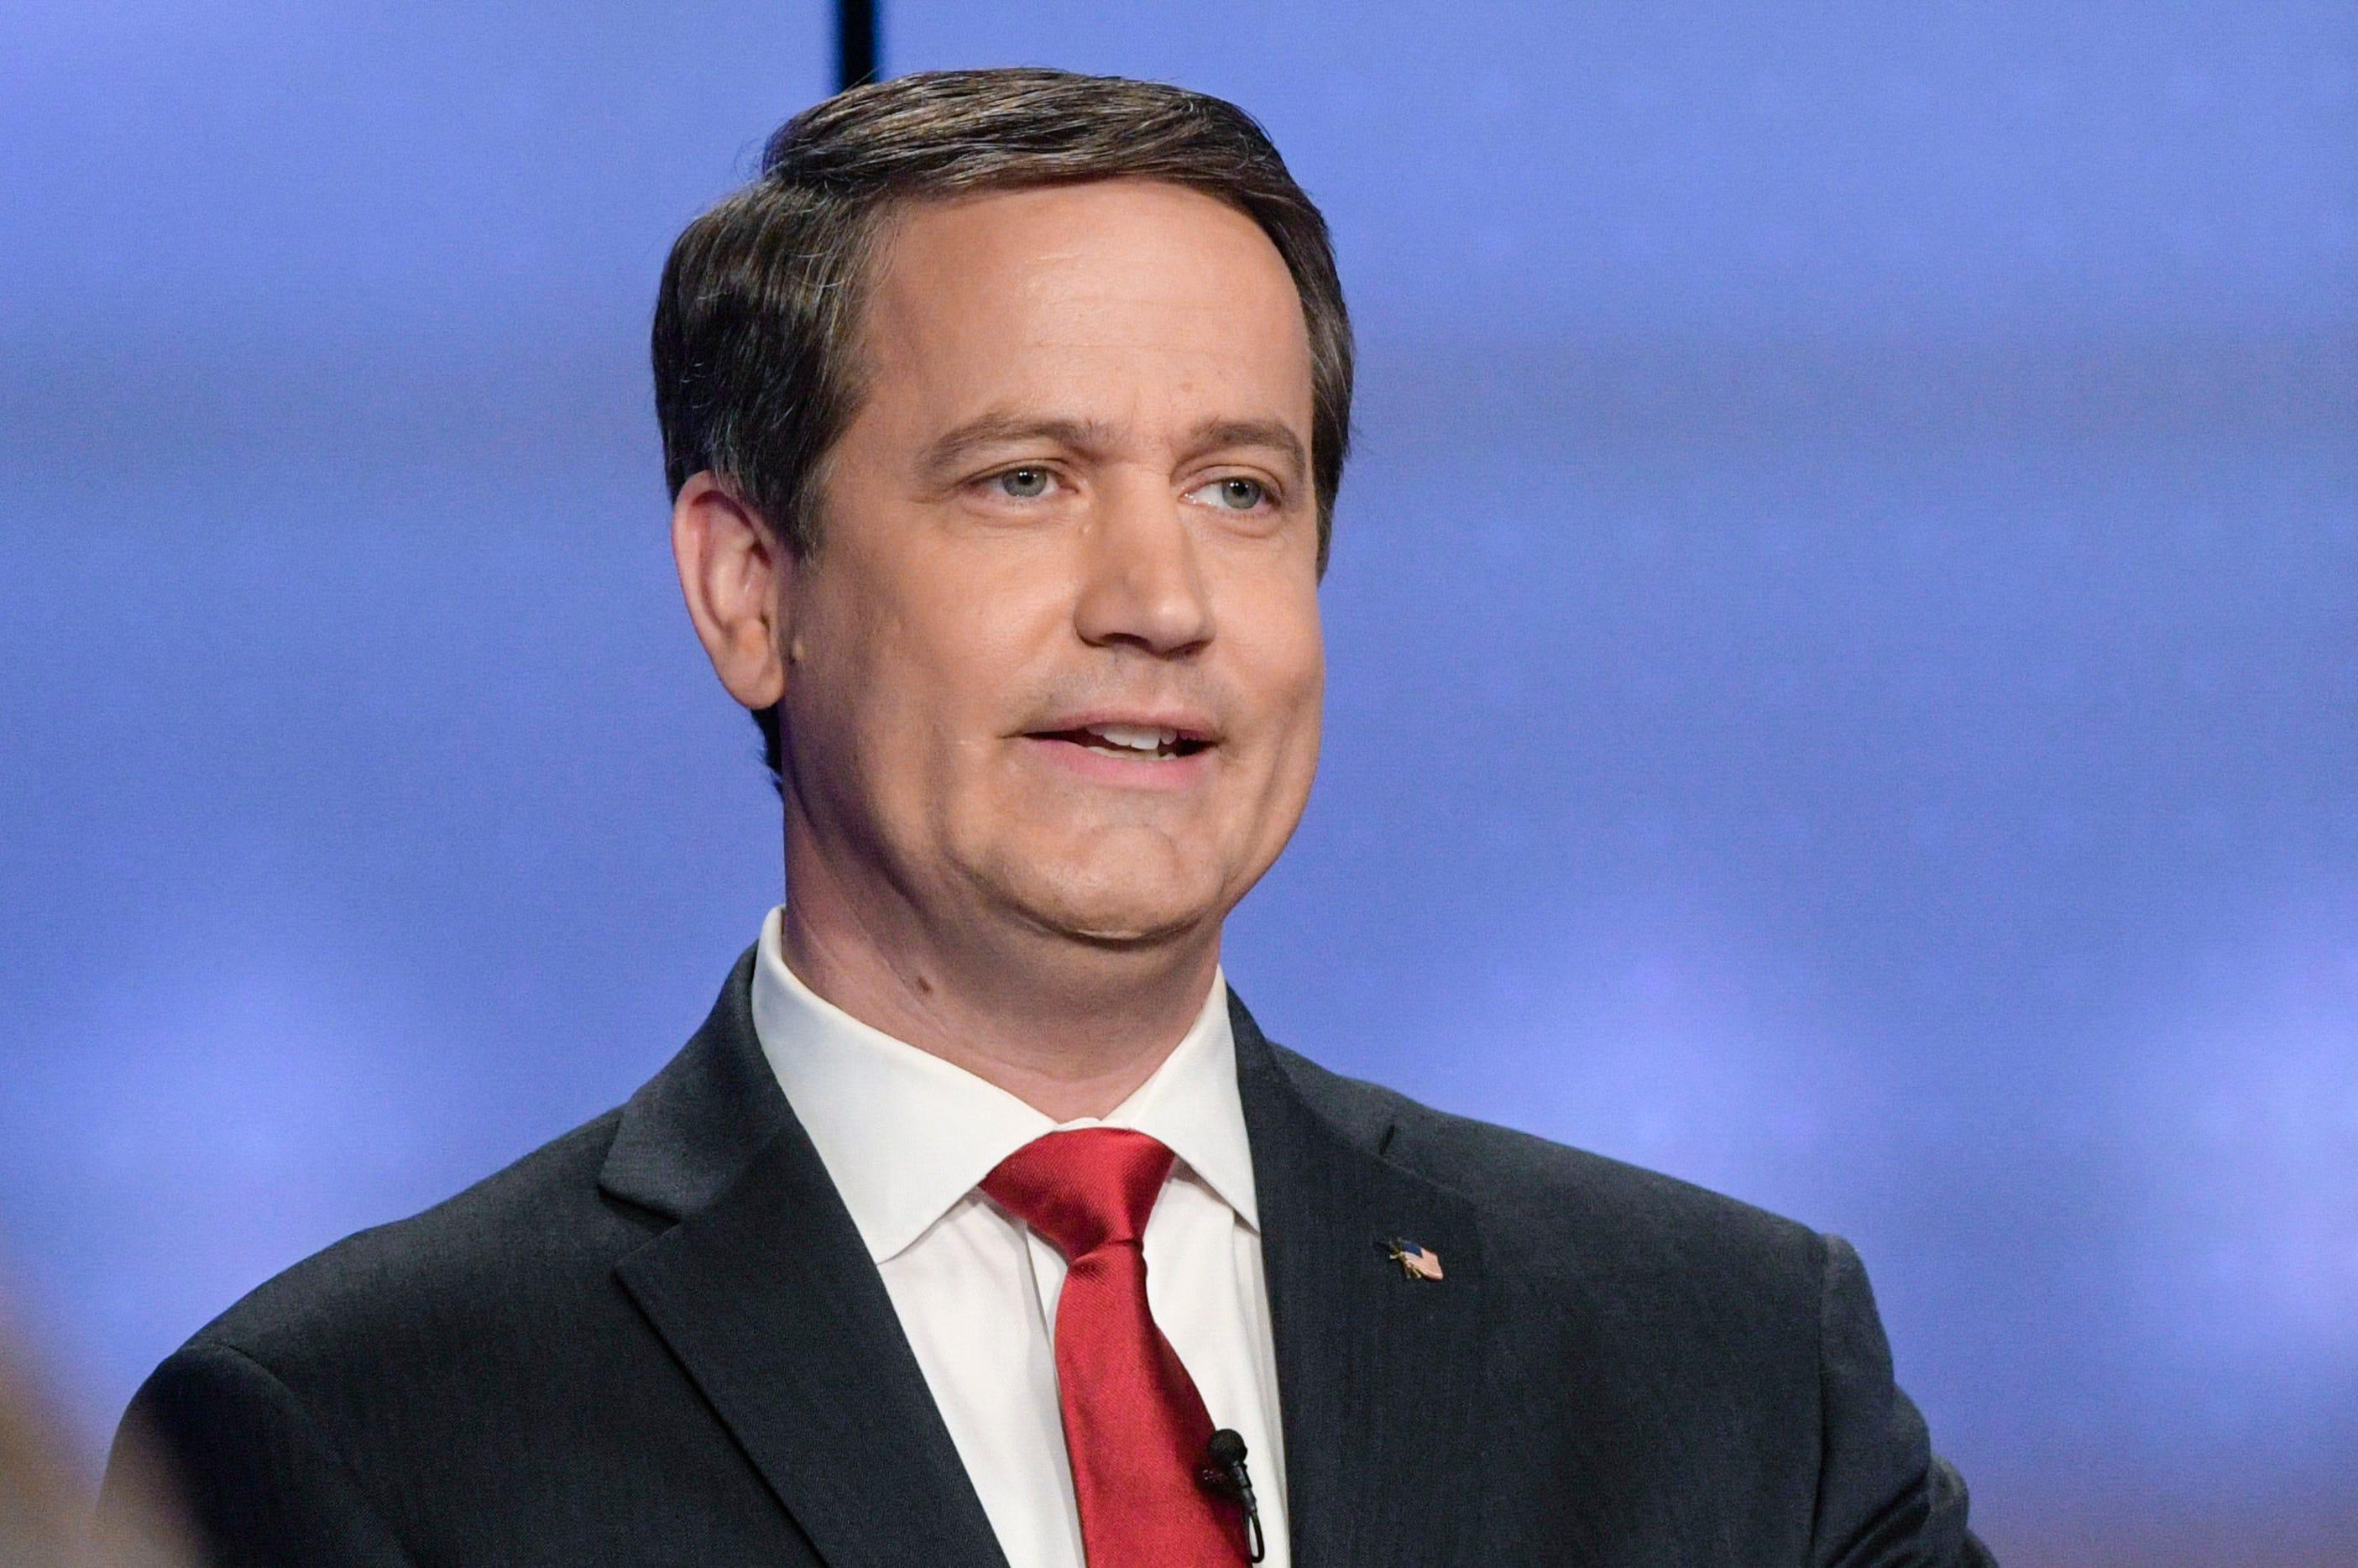 Republican Georgia state Sen. Michael Williams participates in a debate in Atlanta on May 20, 2018, during his failed gubernatorial campaign.